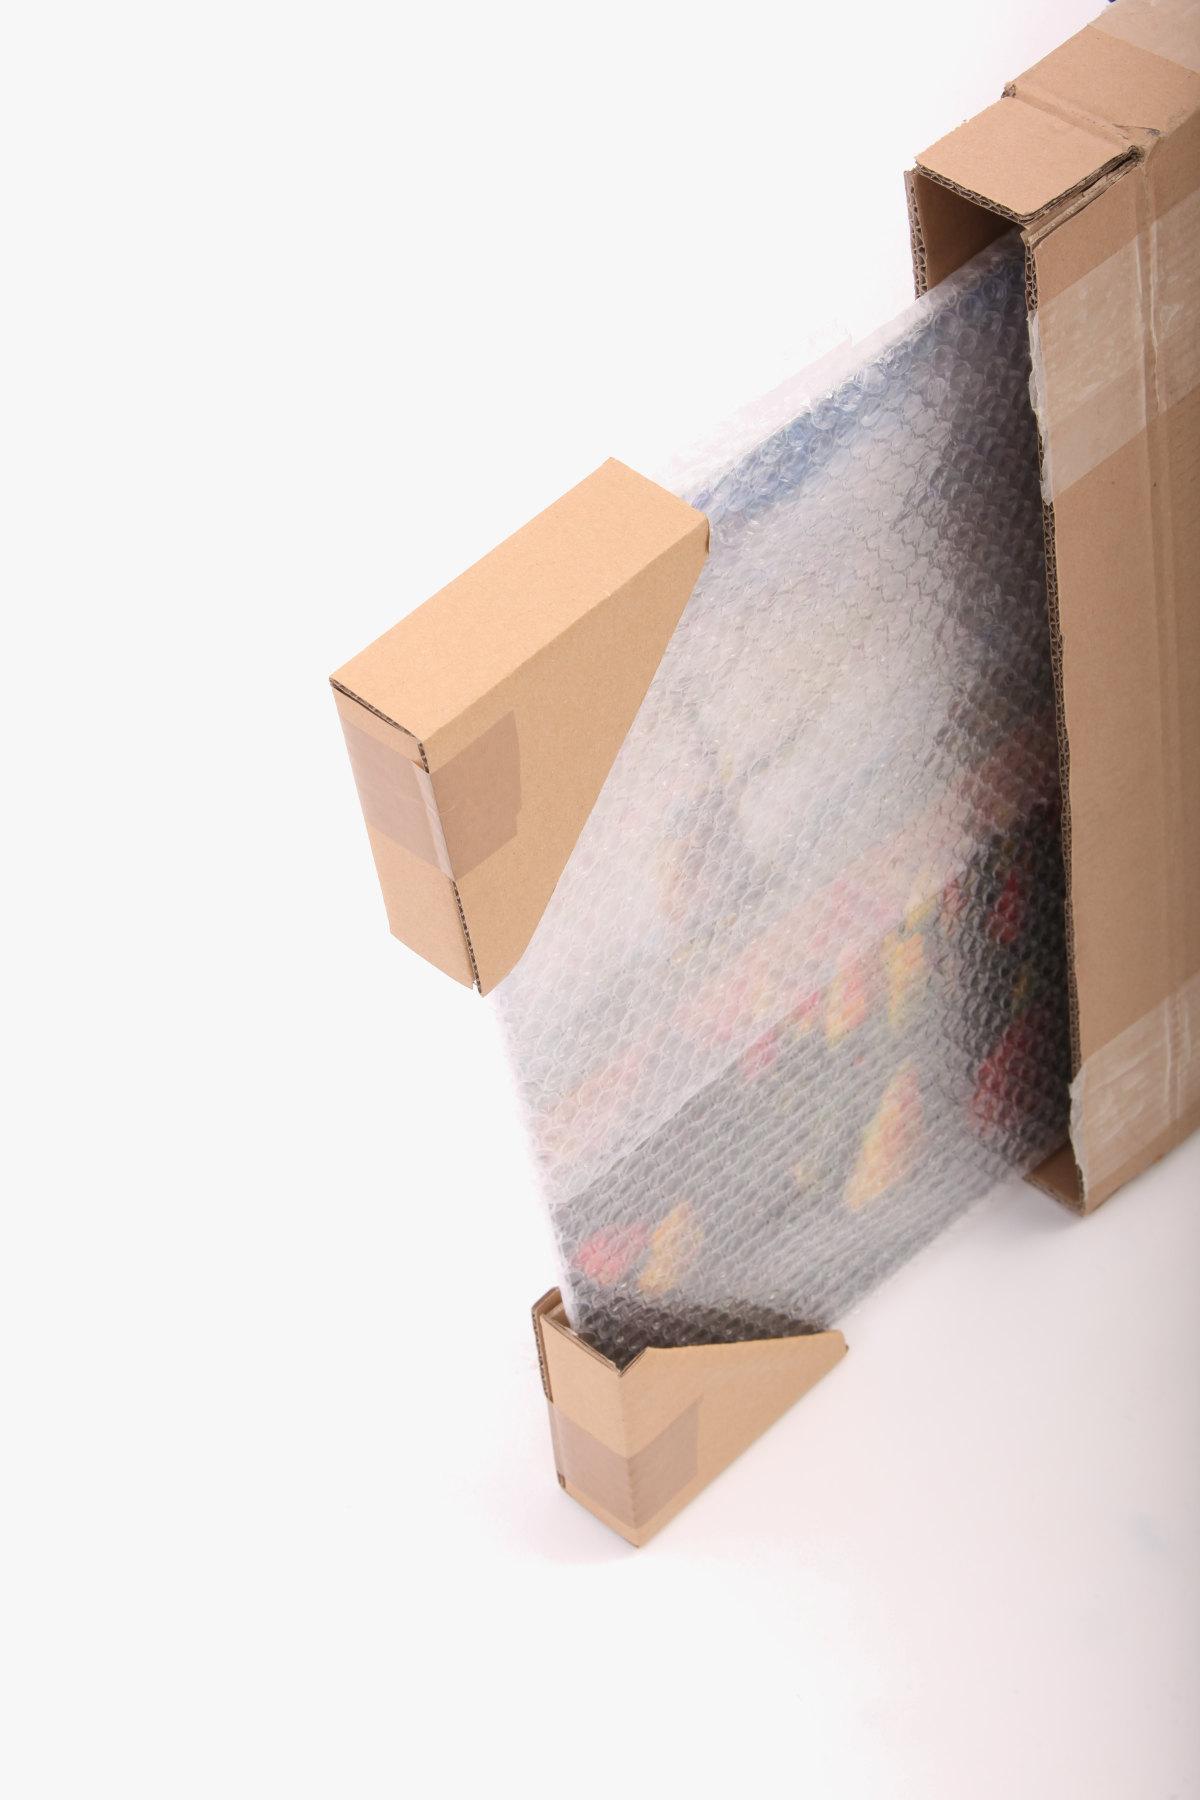 Fotomosaik Verpackung